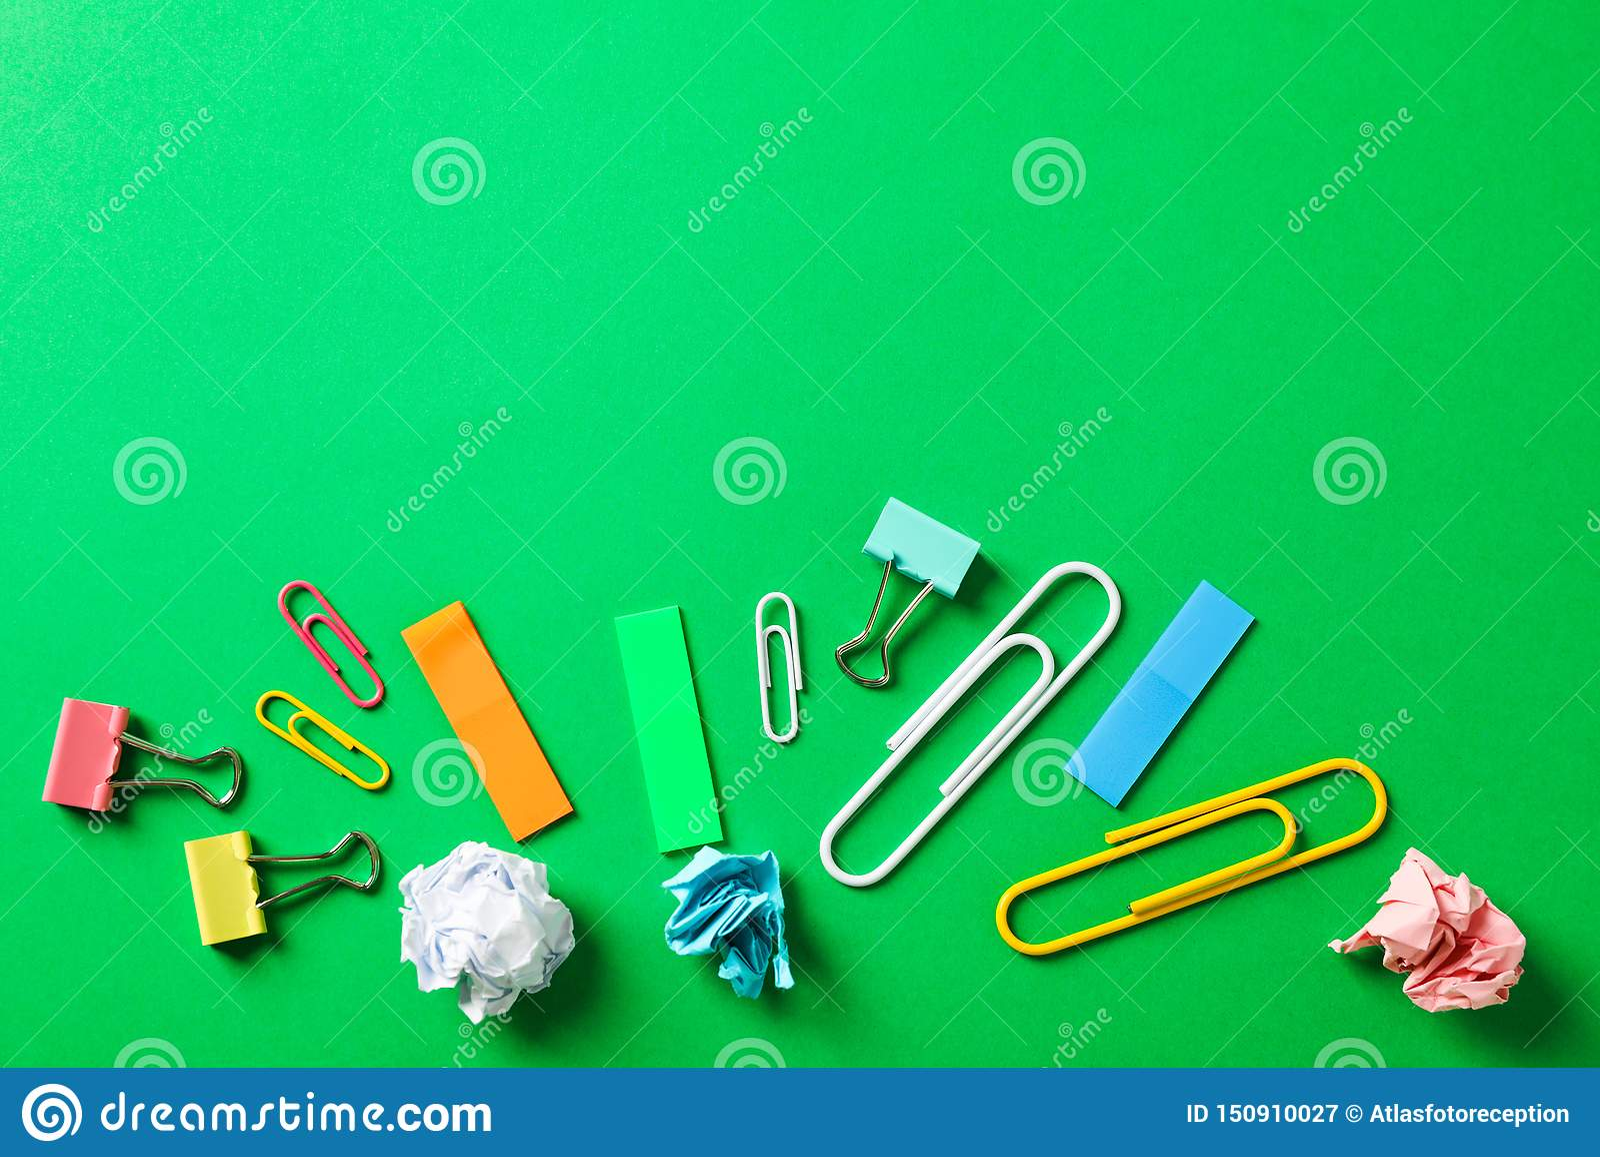 Vlak leg samenstelling met verfrommelde document ballen, klemmen en stickers op kleurenachtergrond